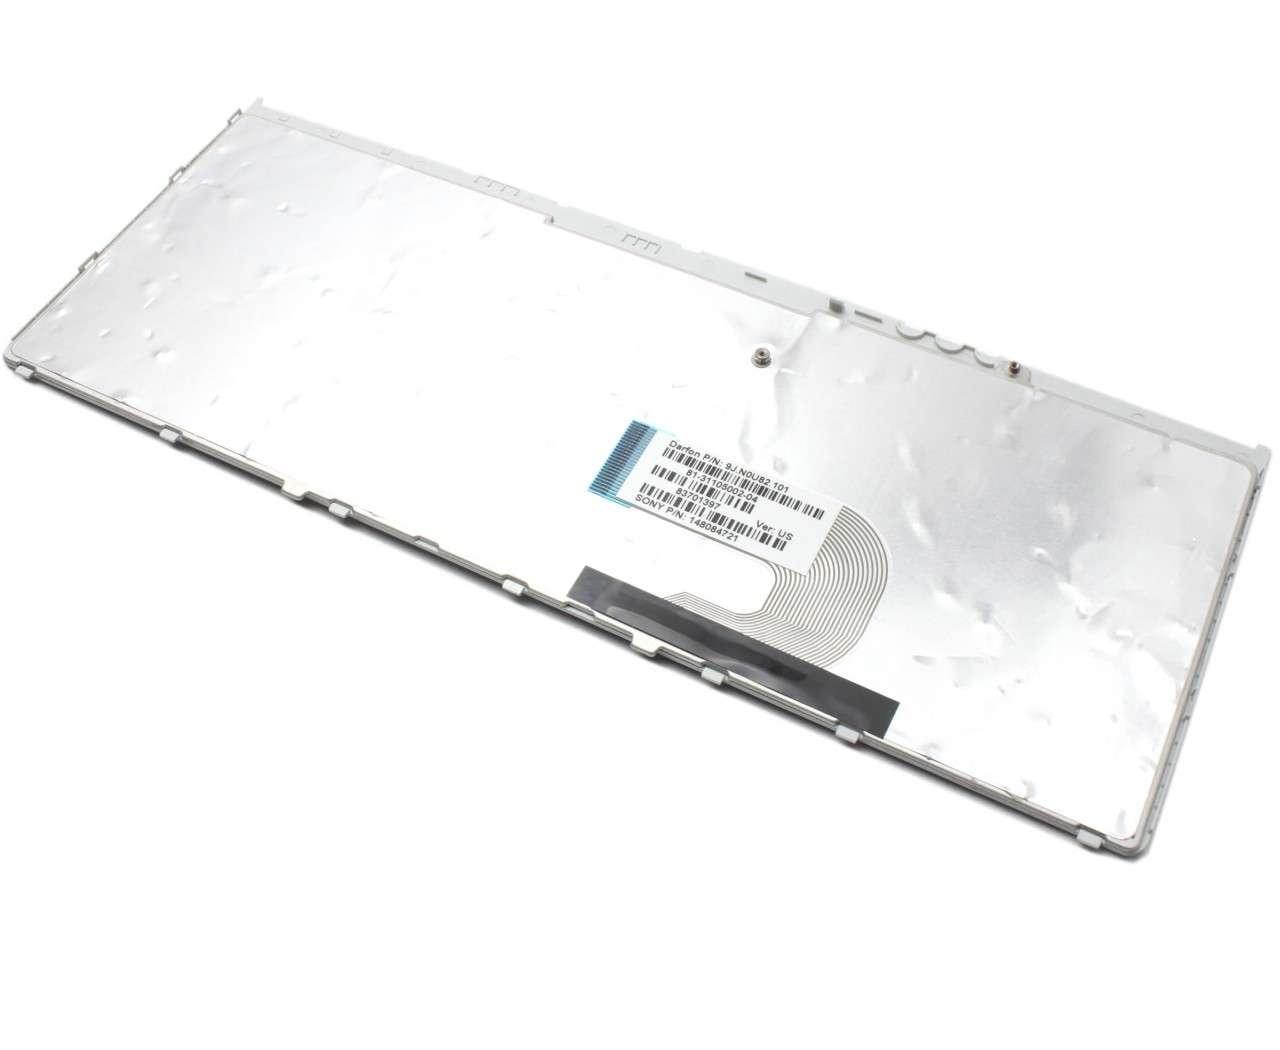 Tastatura Sony Vaio VGN-FW180EH neagra cu rama gri imagine powerlaptop.ro 2021